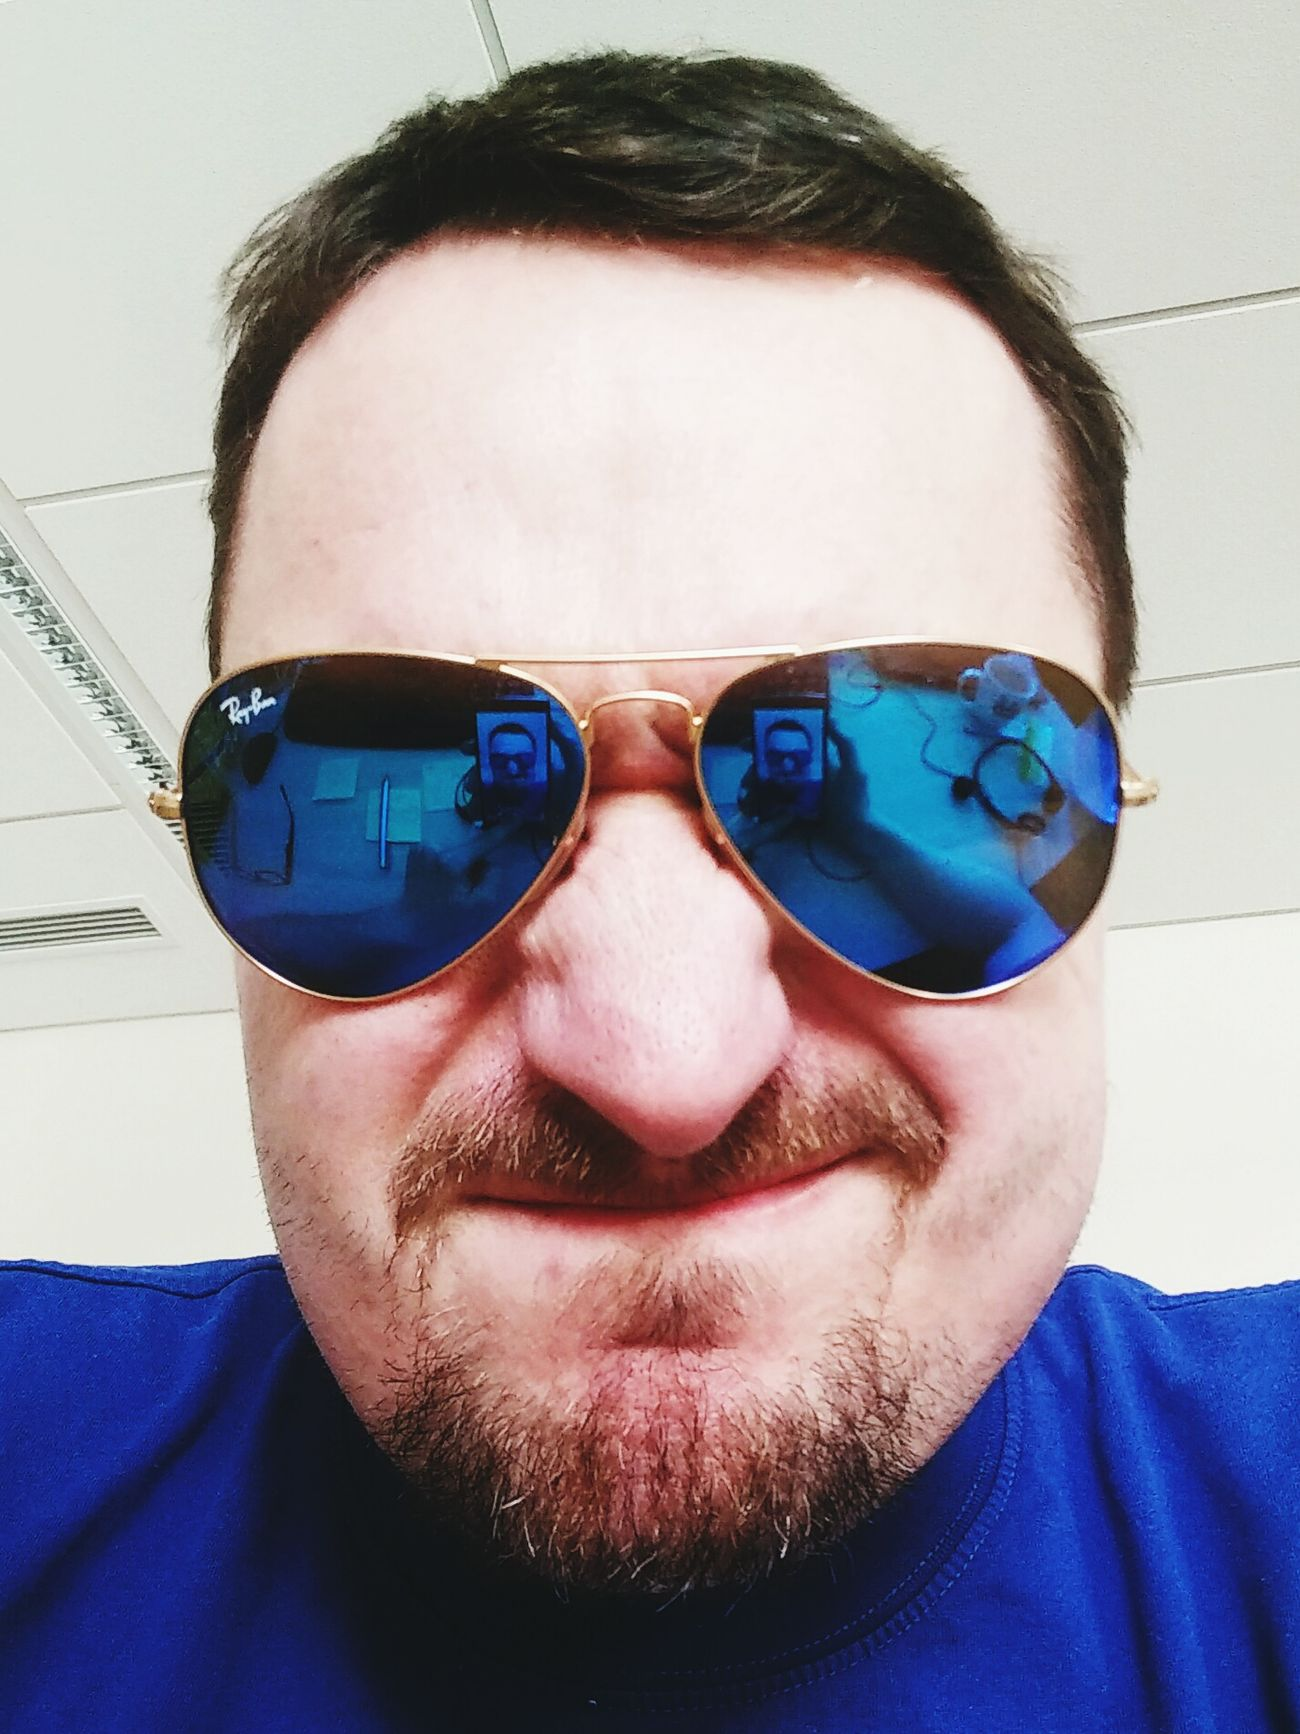 Selfie Raybansunglasses Rayban Feel Blue Blue Glasses Reflect Reflection Sunglasses